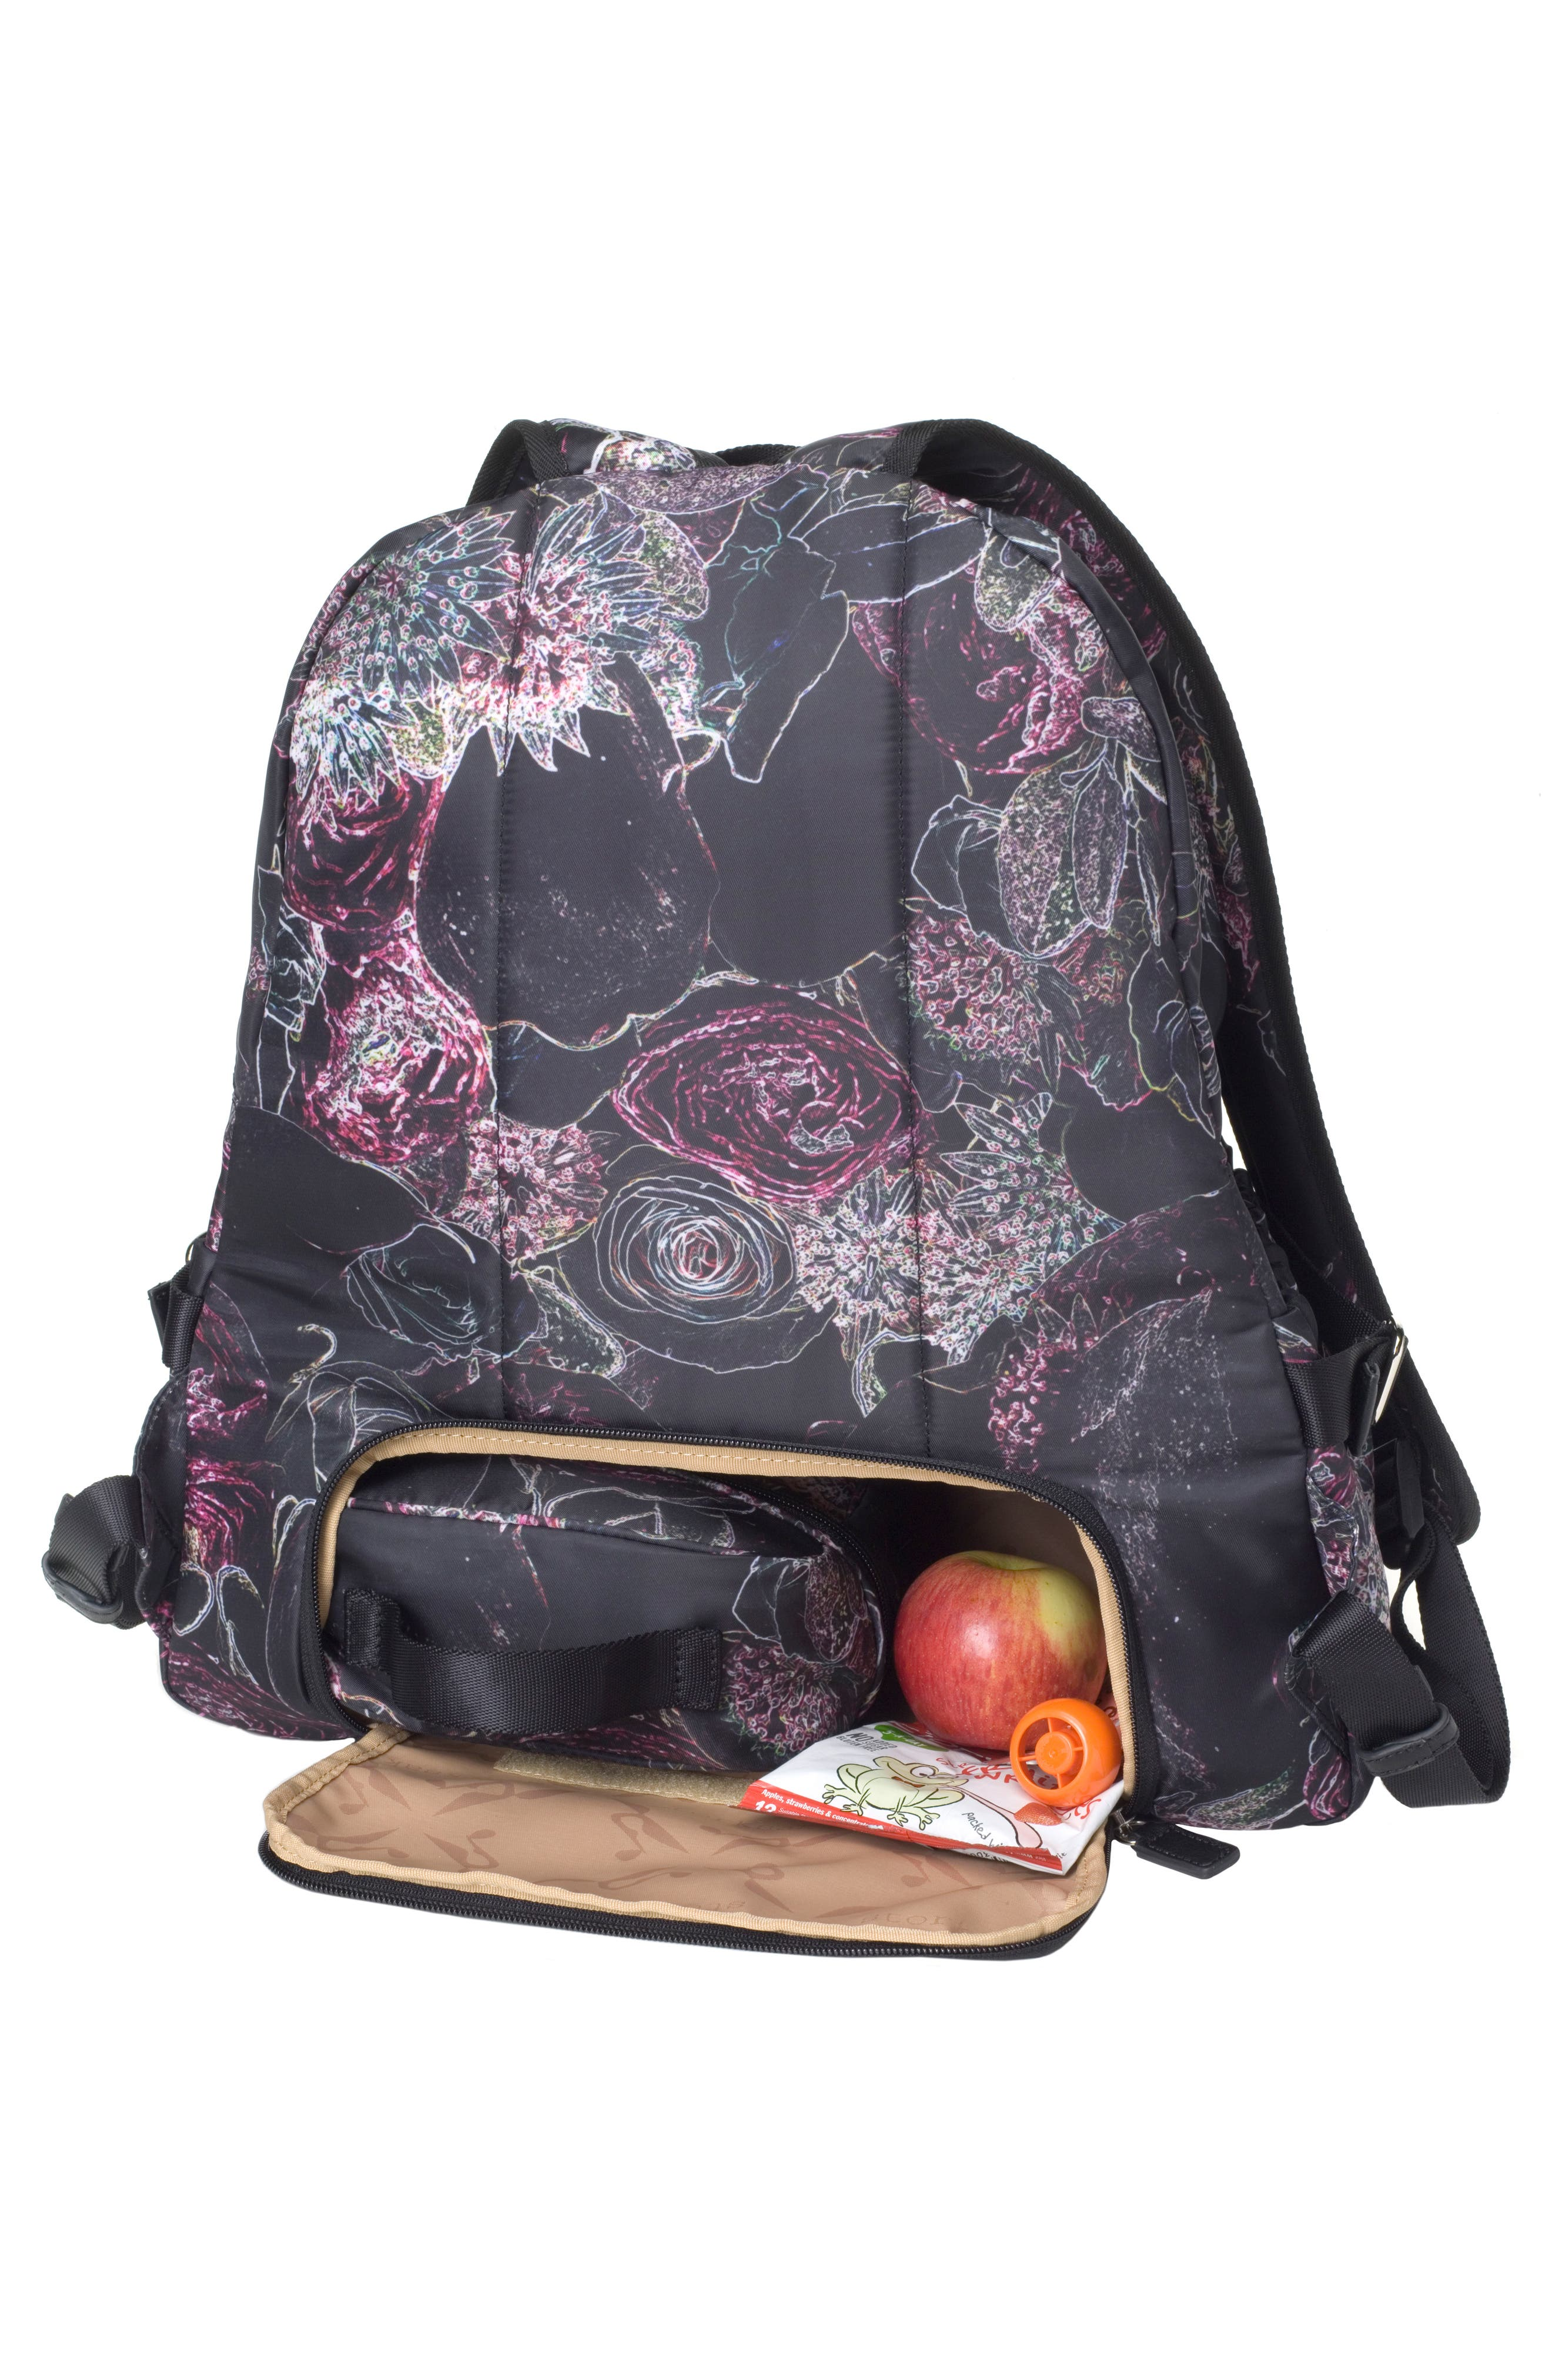 Hero Water Resistant Nylon Backpack Diaper Bag,                             Alternate thumbnail 13, color,                             Neon Floral